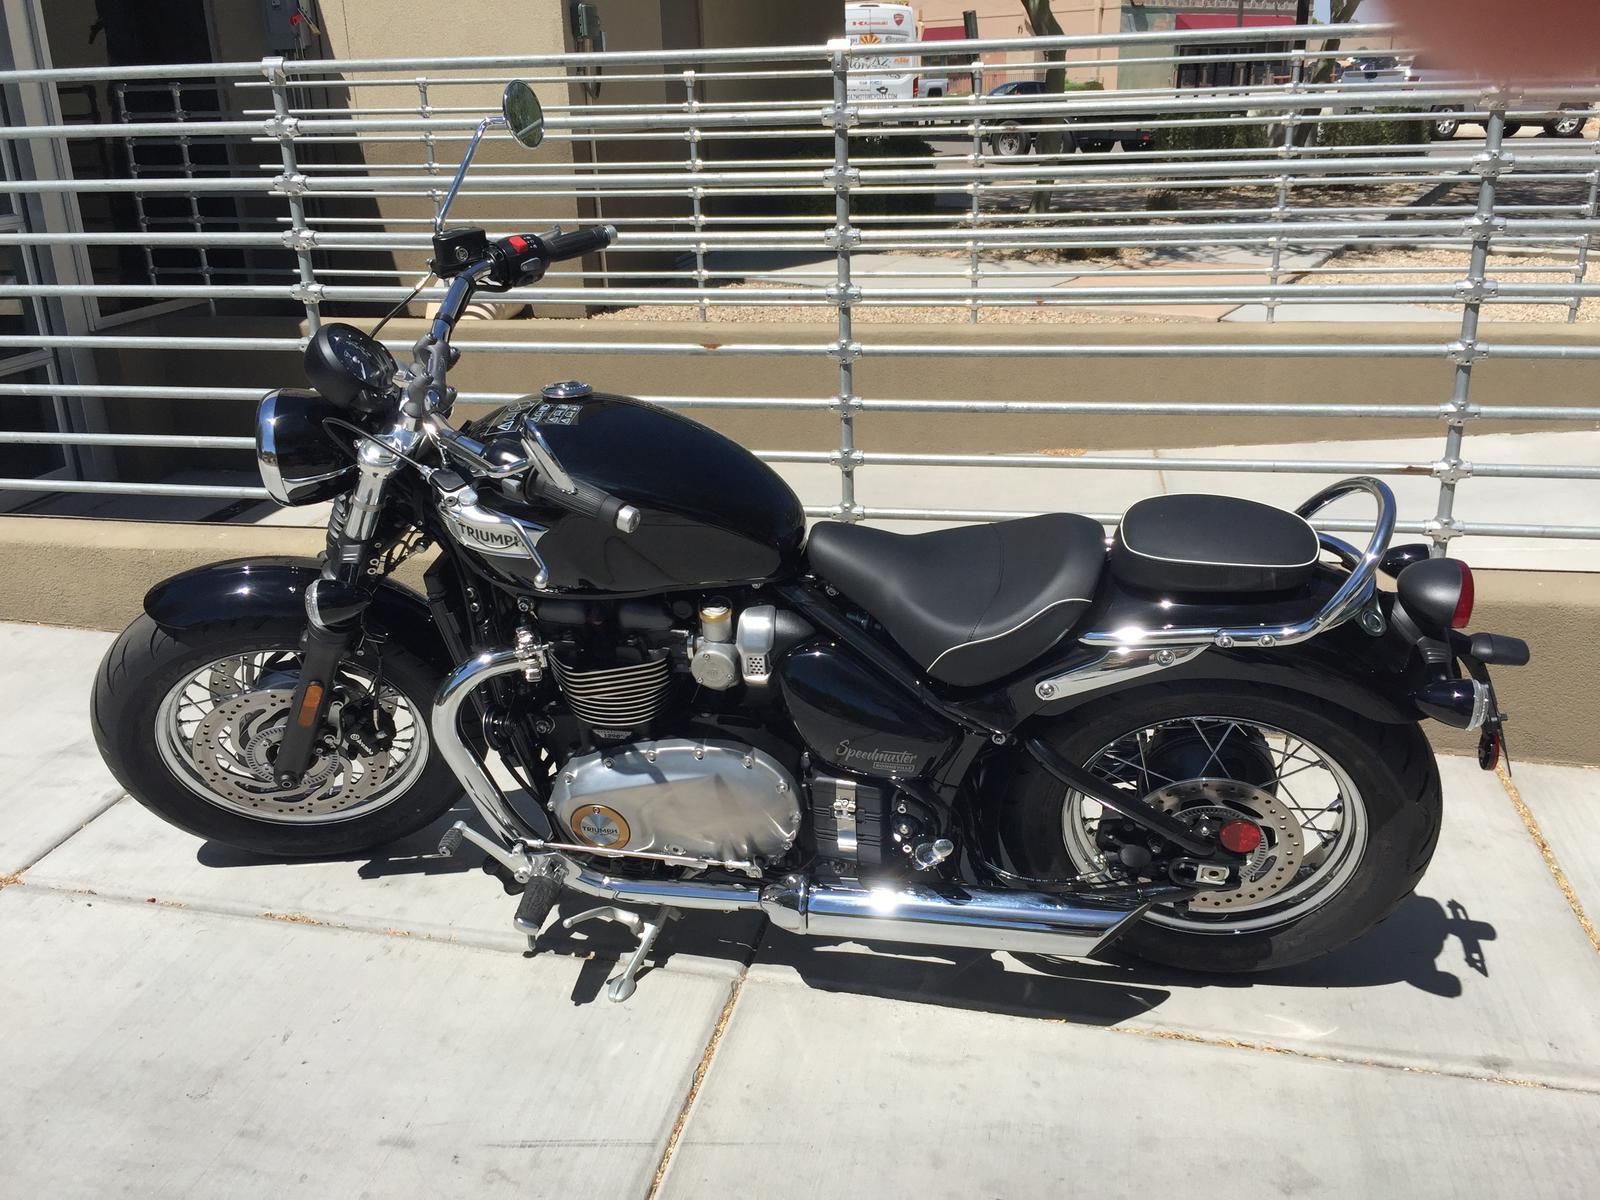 2018 Triumph Speedmaster For Sale In Peoria Az Go Az Motorcycles